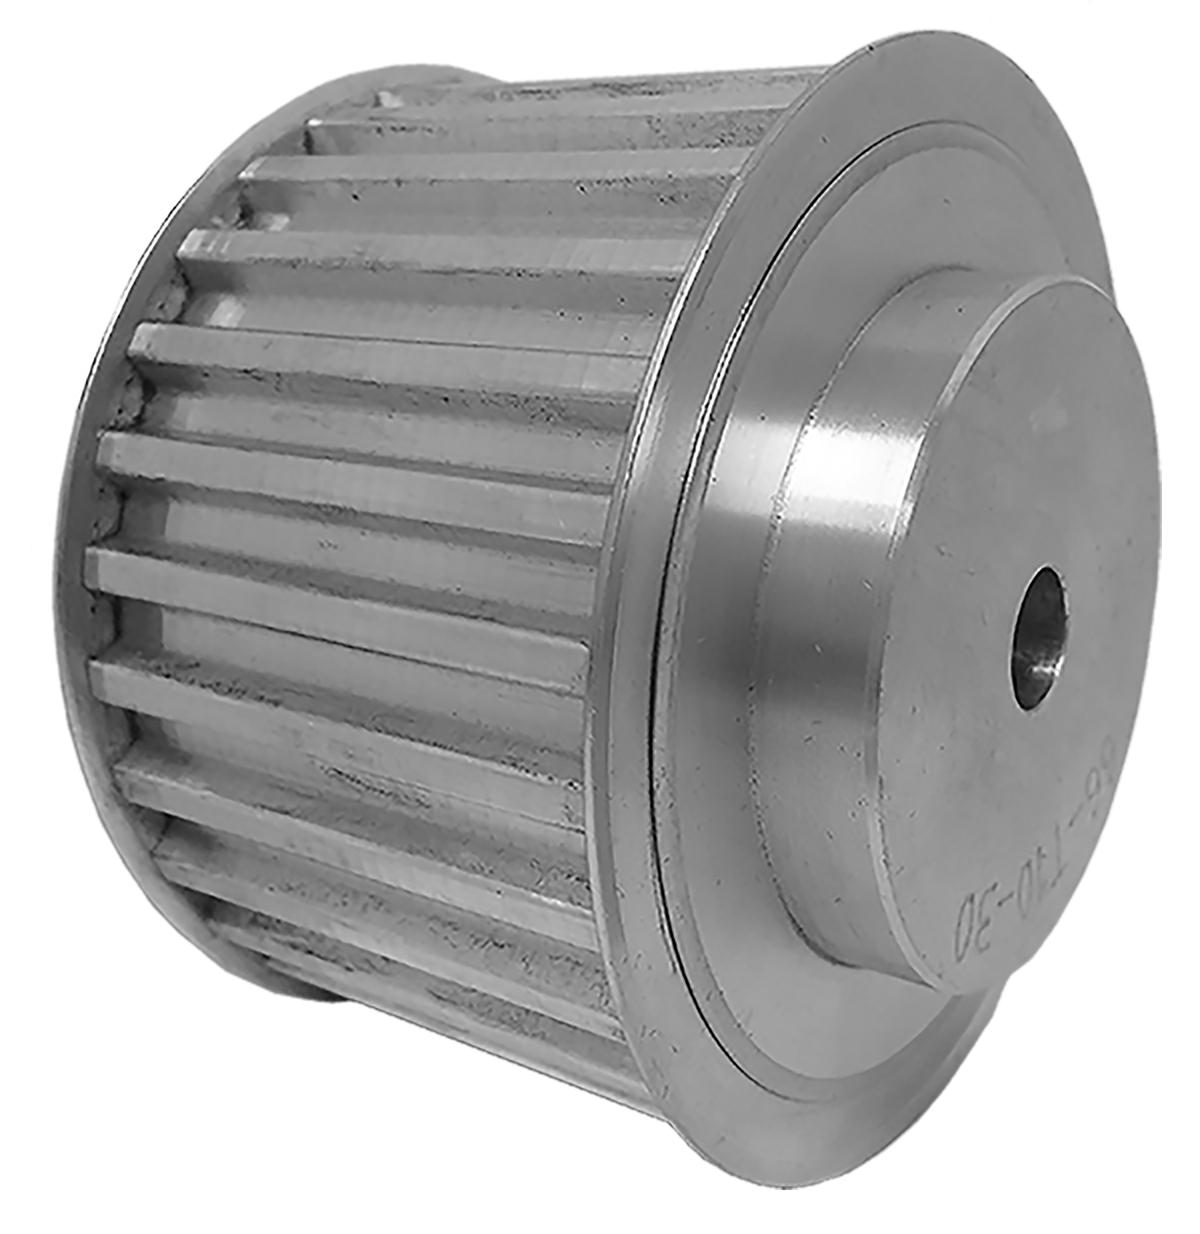 66T10/30-2 - Aluminum Metric Pulleys